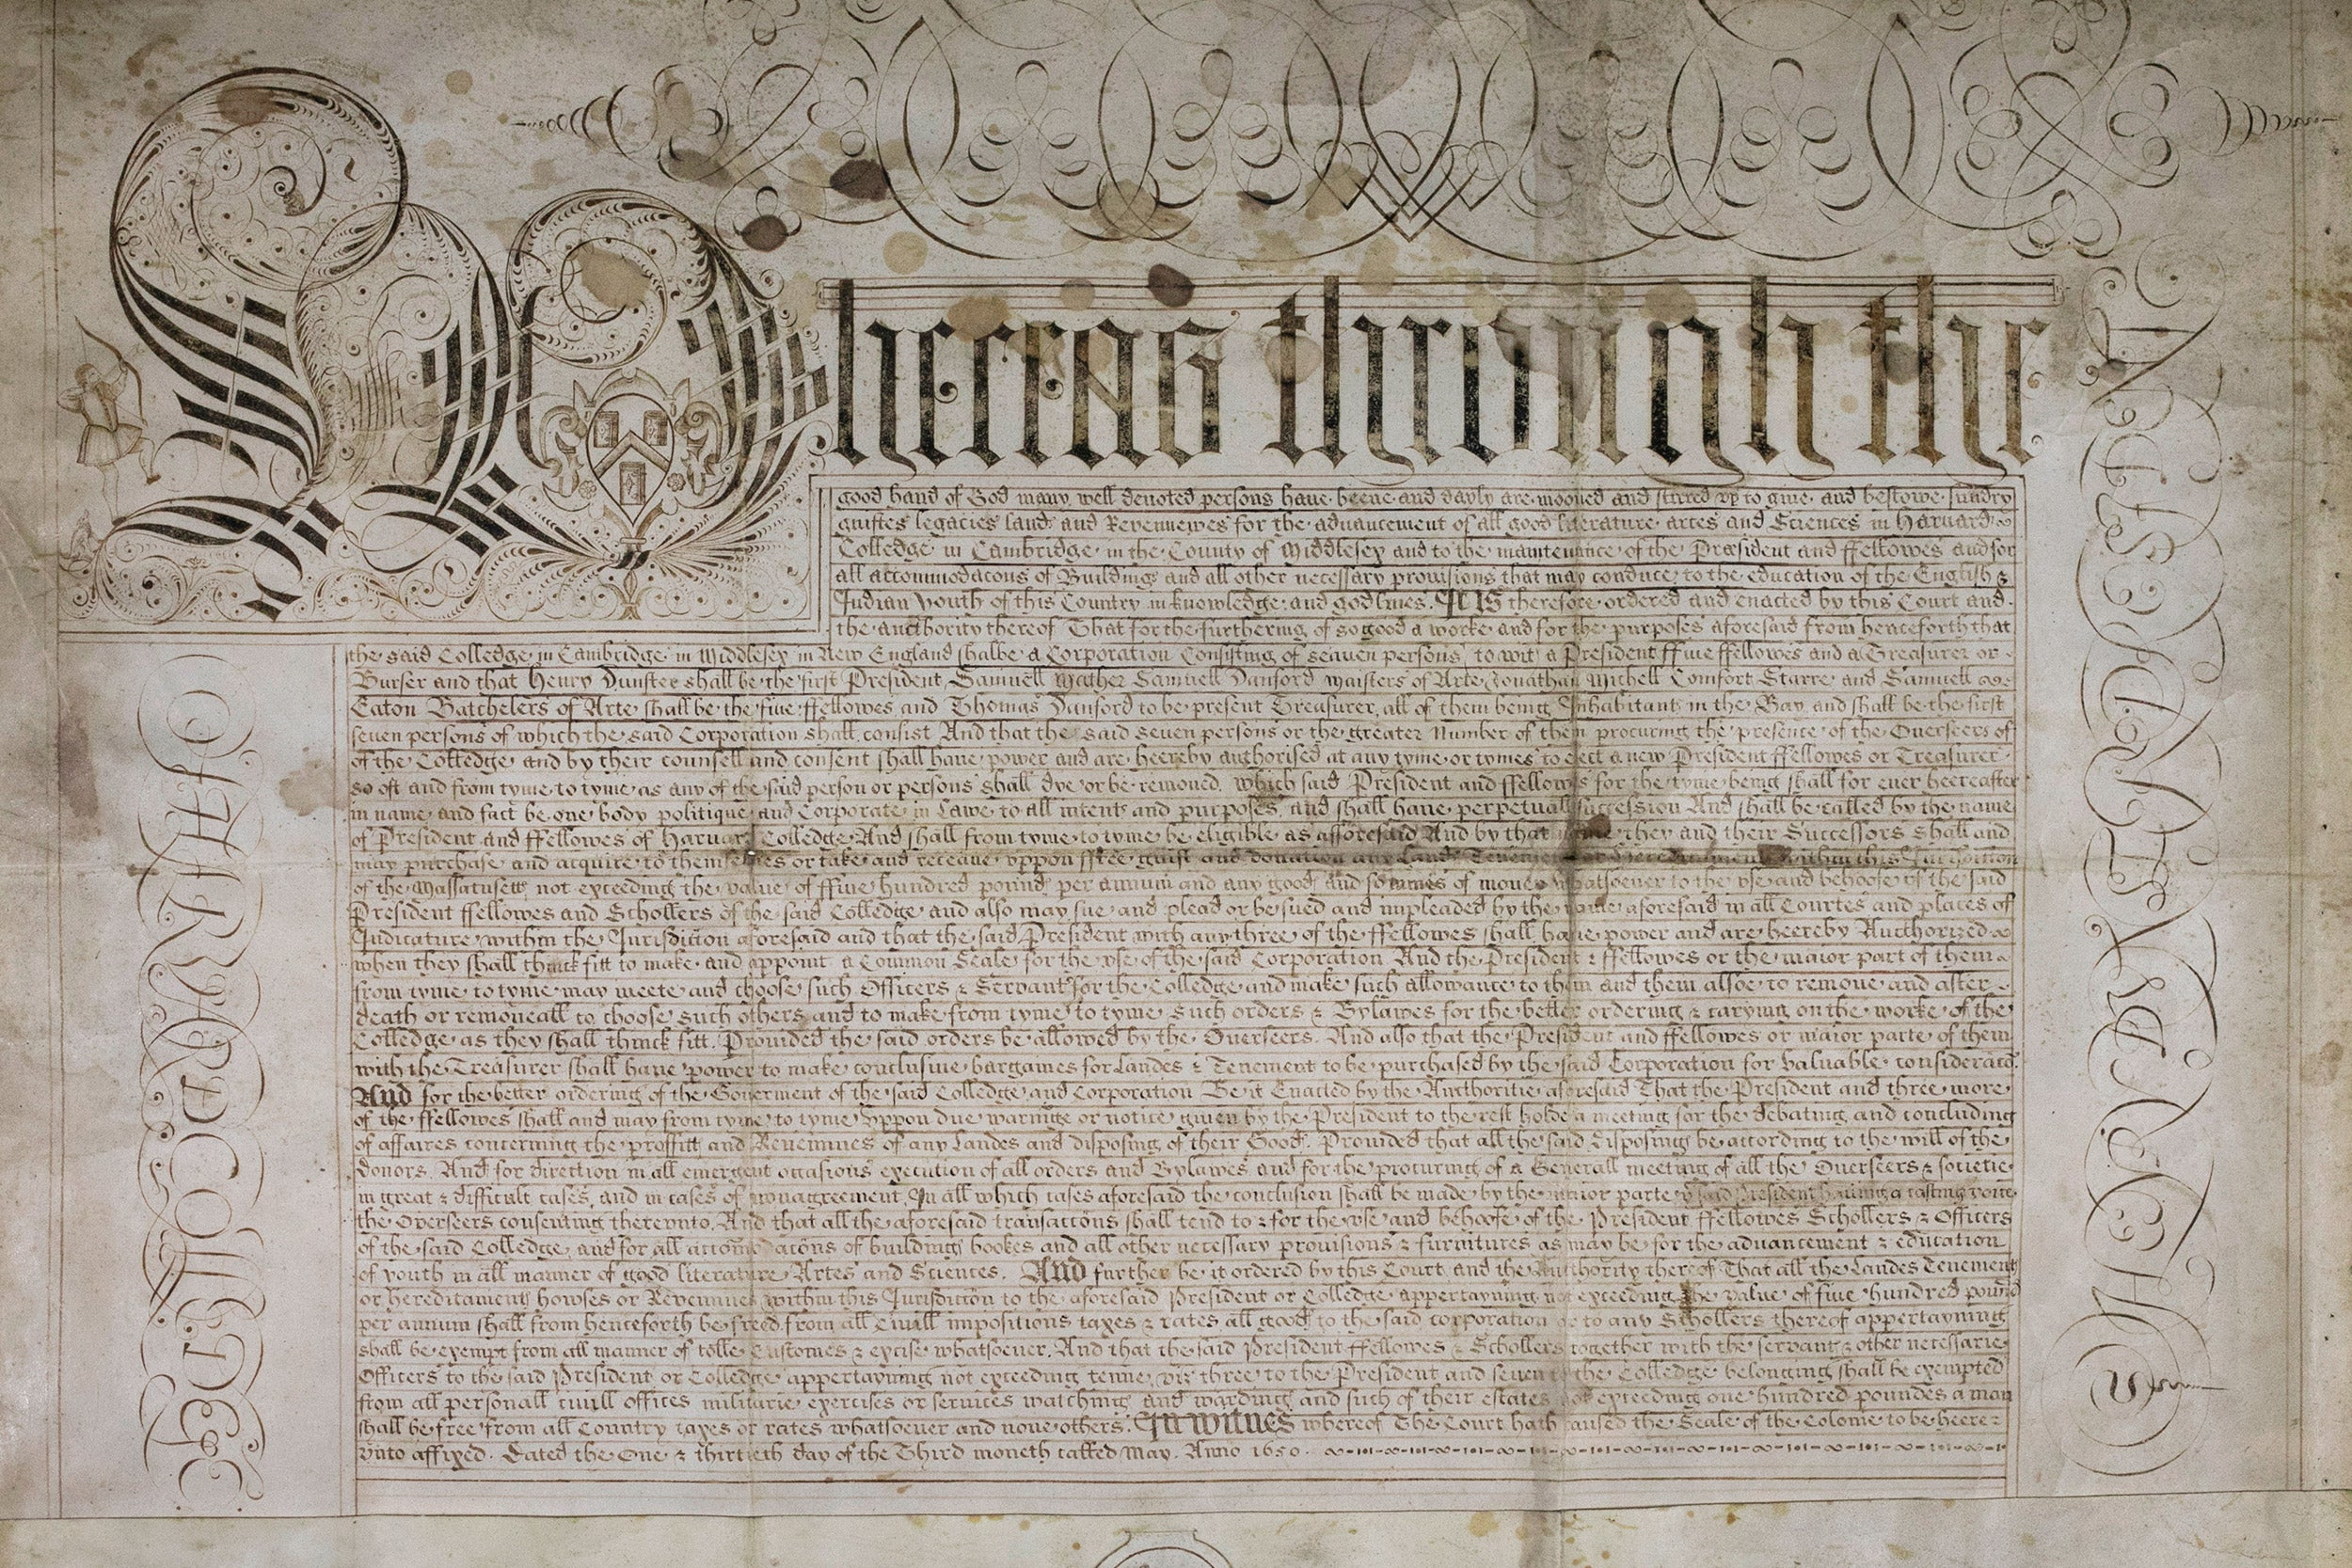 Harvard Charter